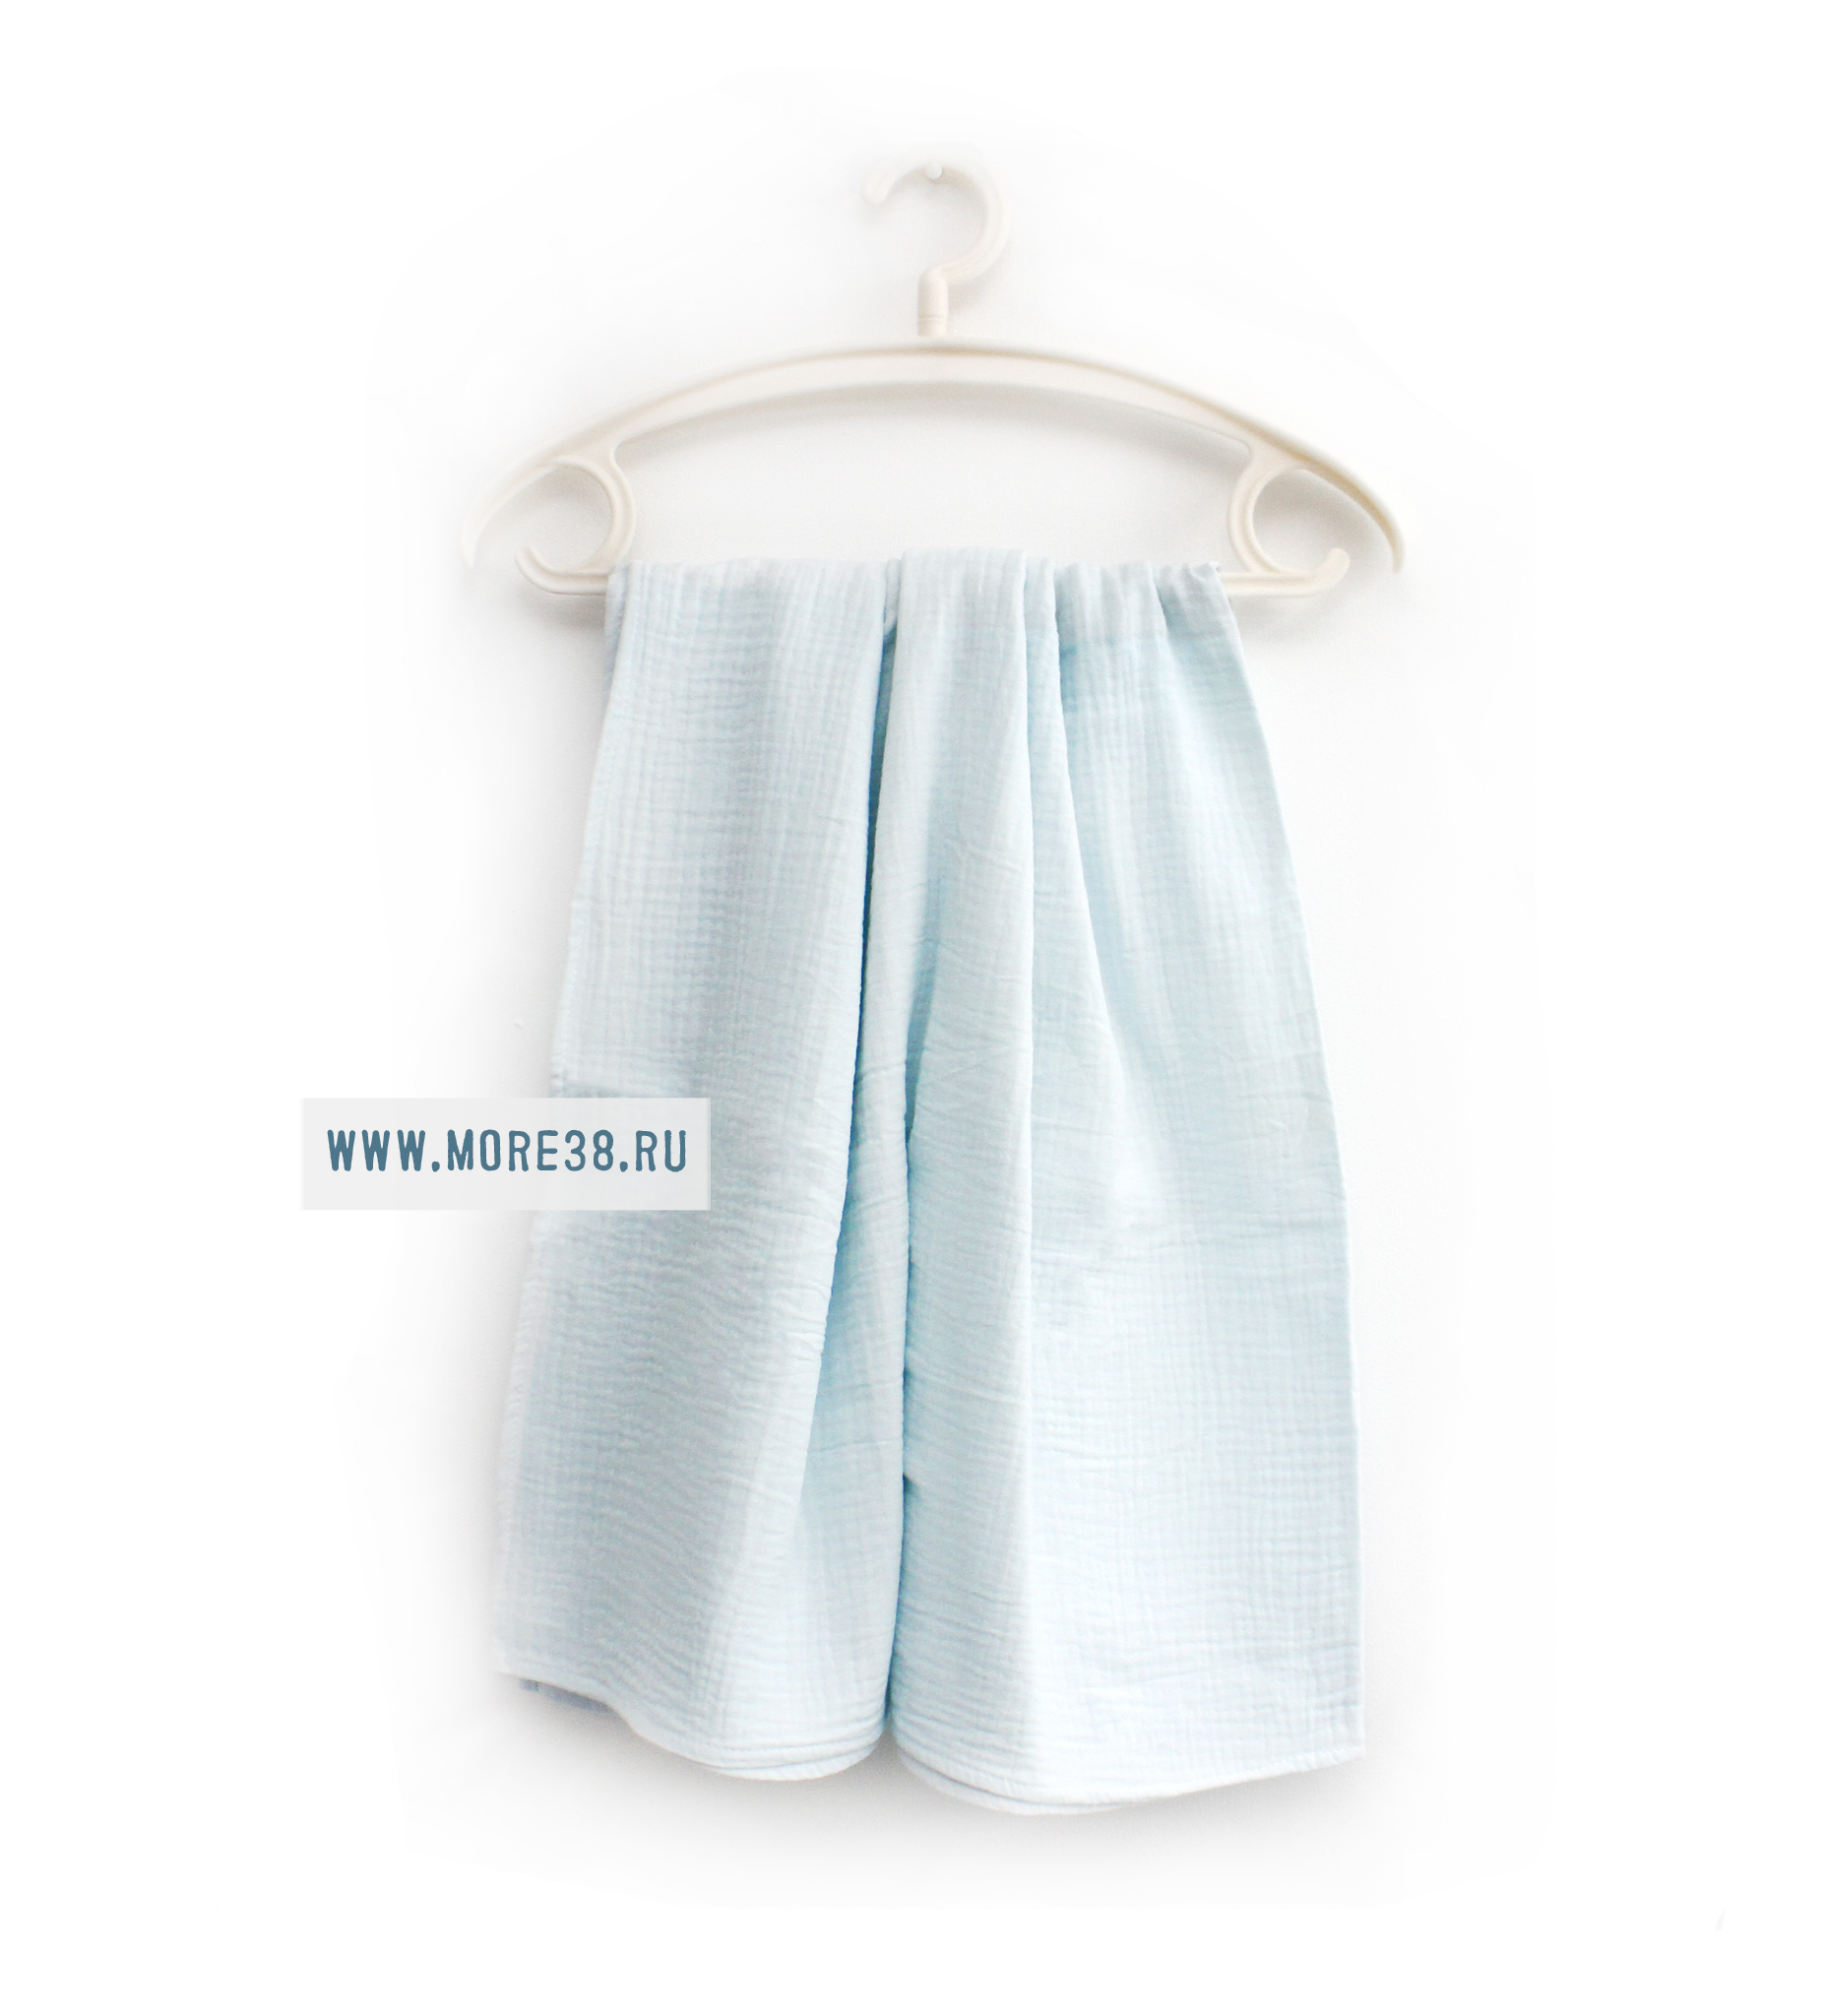 Муслиновая пеленка,голубой,1205(100х130 см)